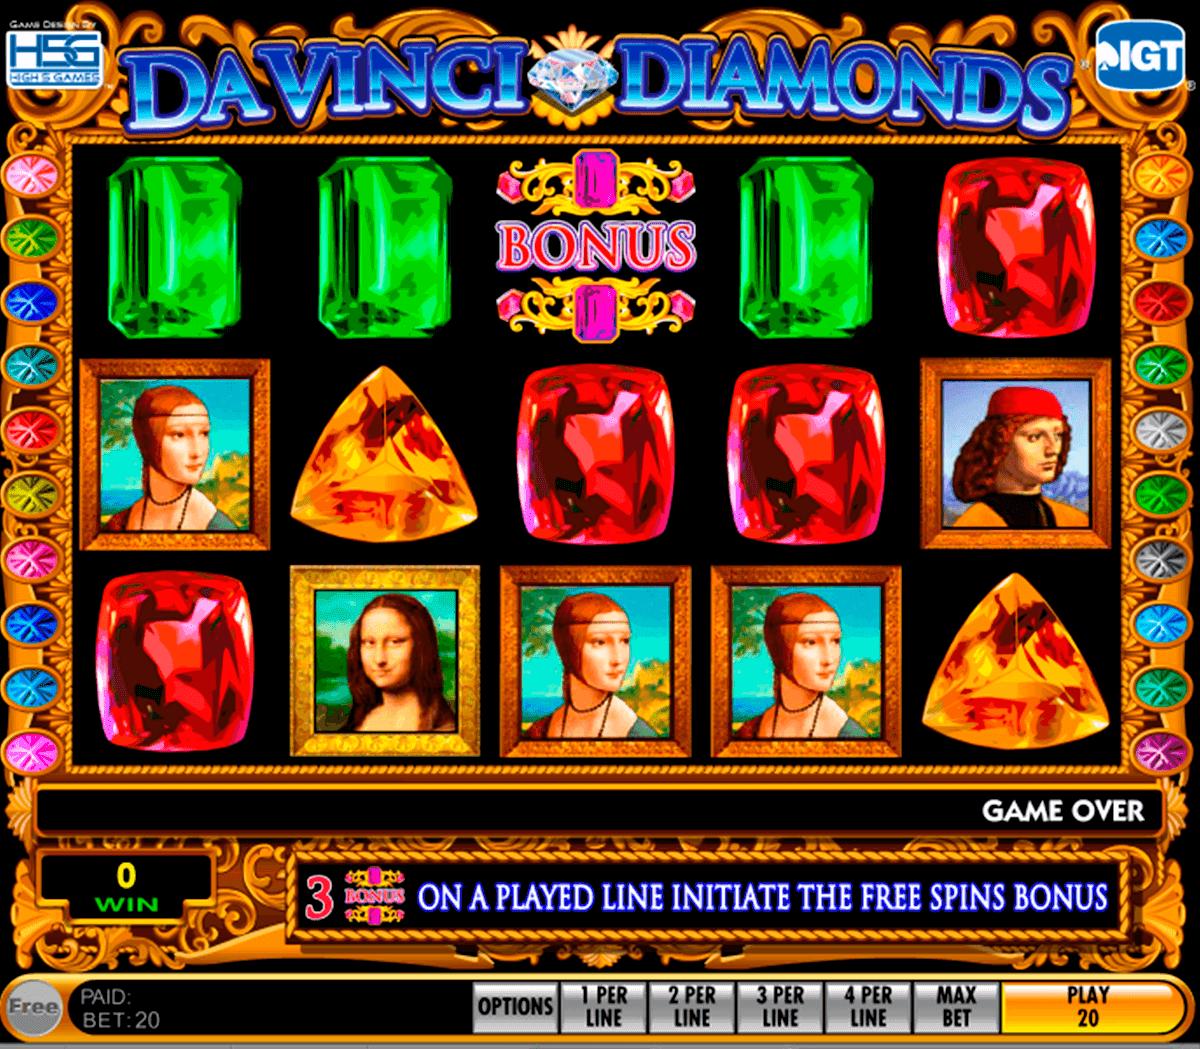 Da vinci diamonds masterworks igt casino slots bossier omania